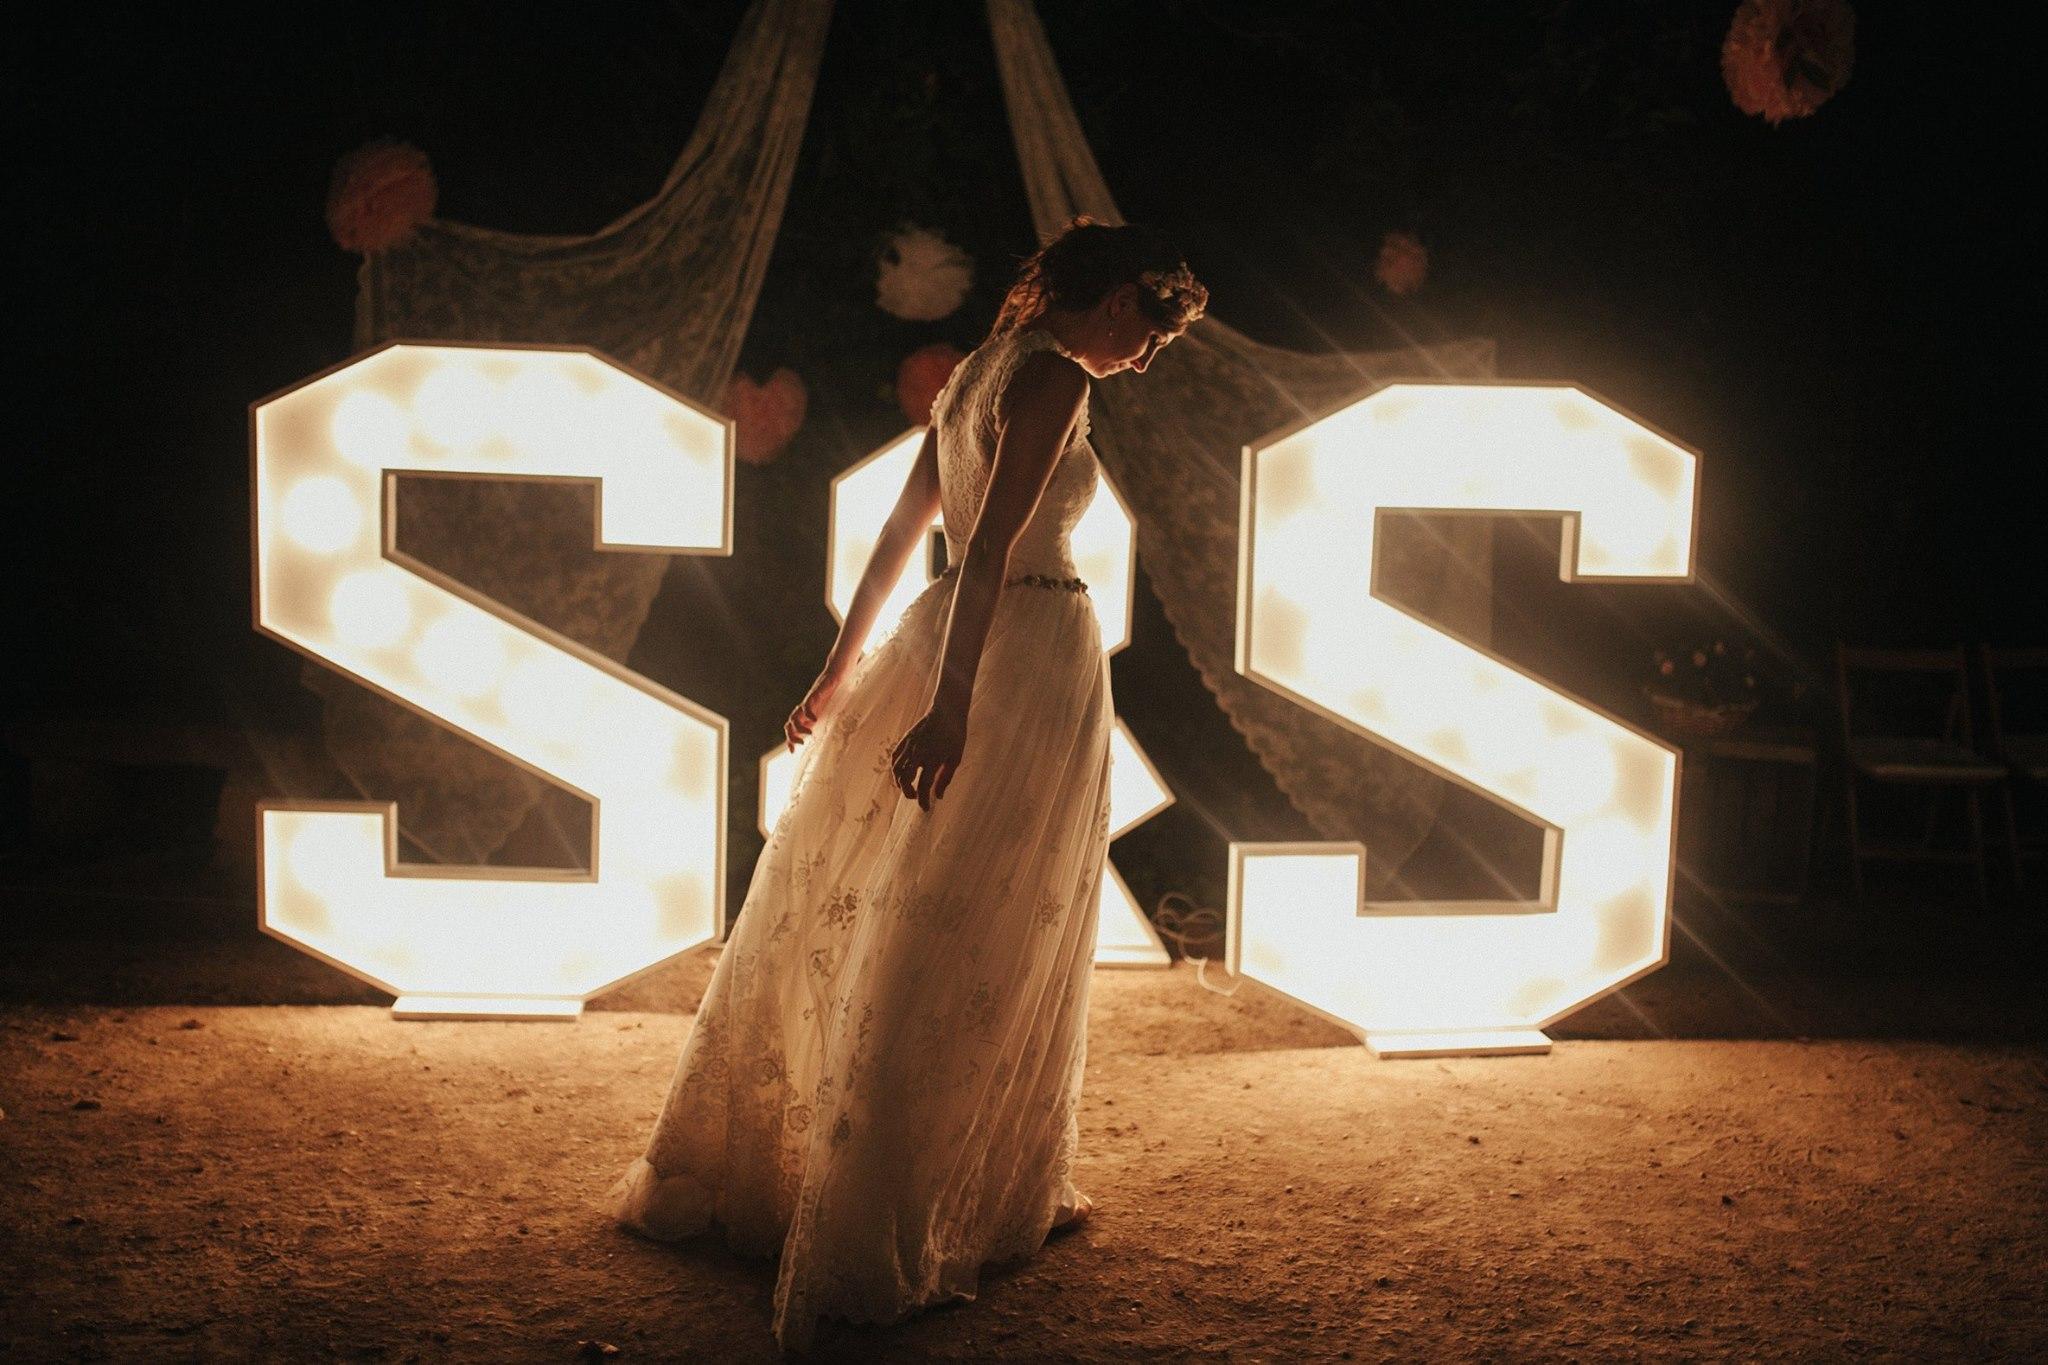 Boda&Films I Fotografo y videógrafo de bodas en Valencia.